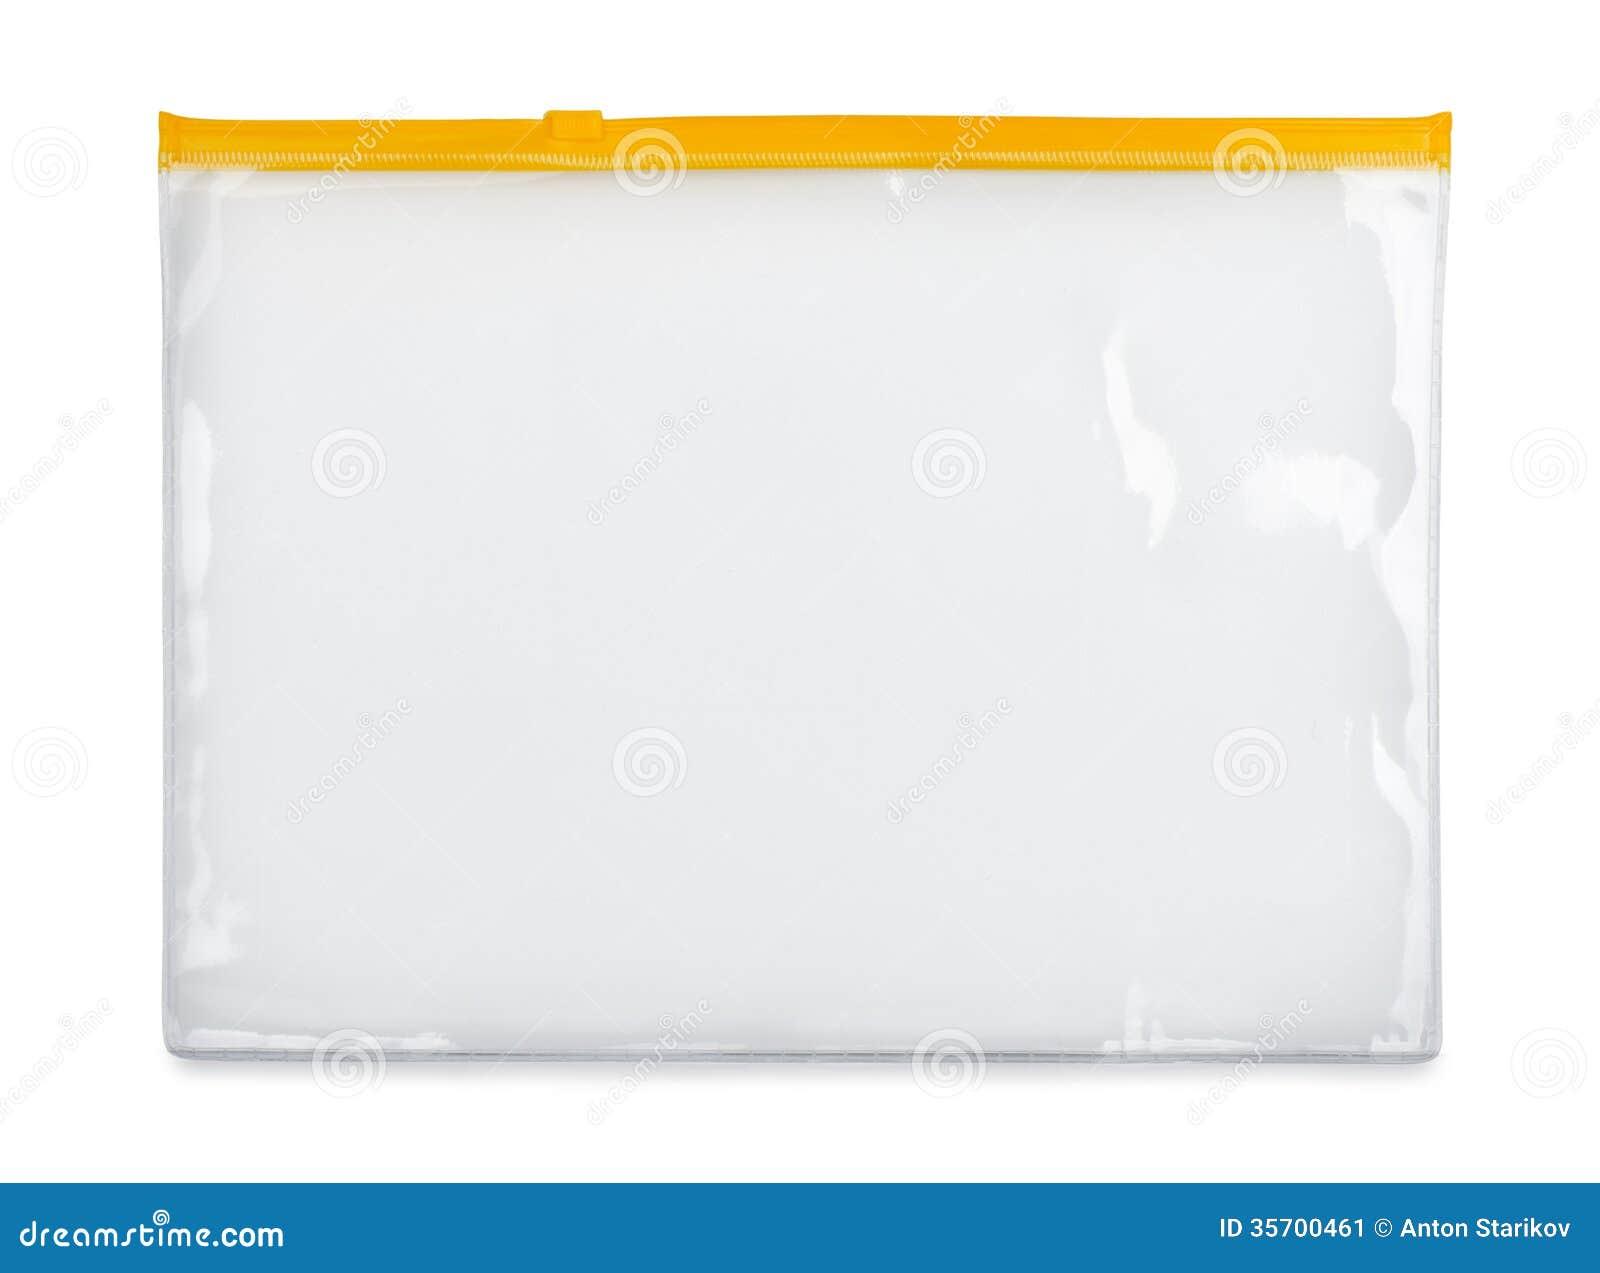 plastic zipper bag stock image image of pocket clipping